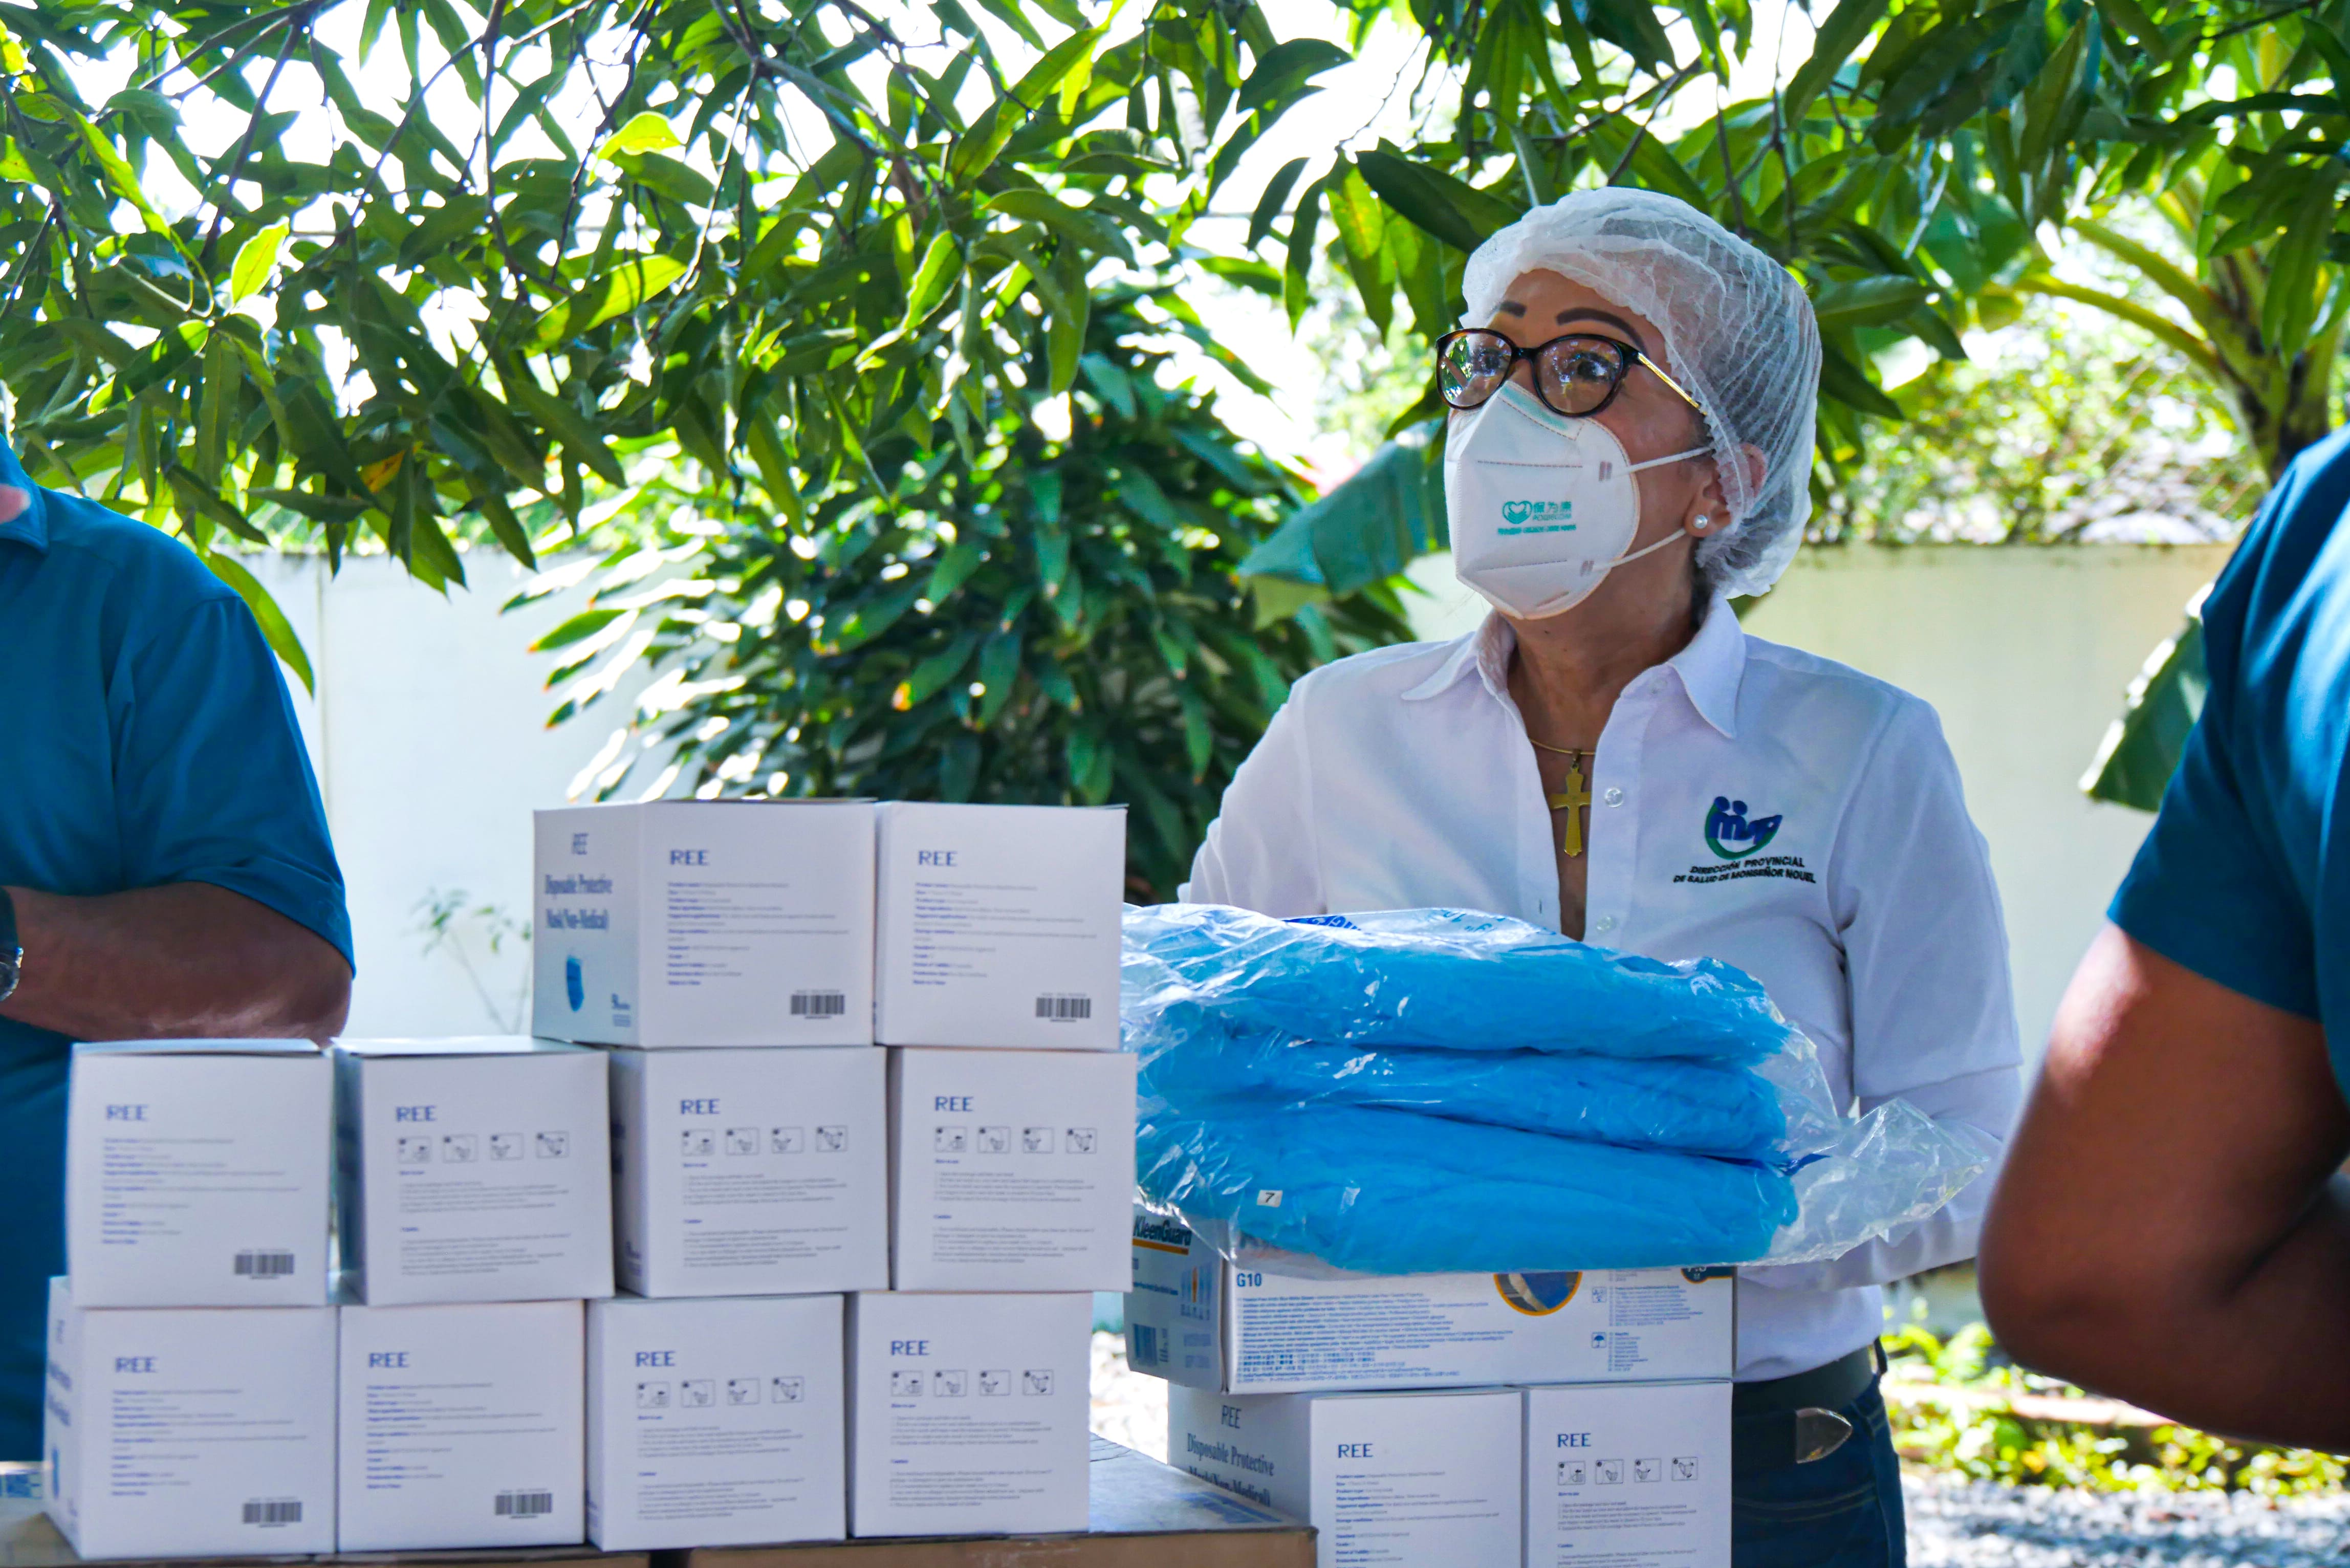 FALCONDO dona insumos de protección ante crisis sanitaria por COVID-19